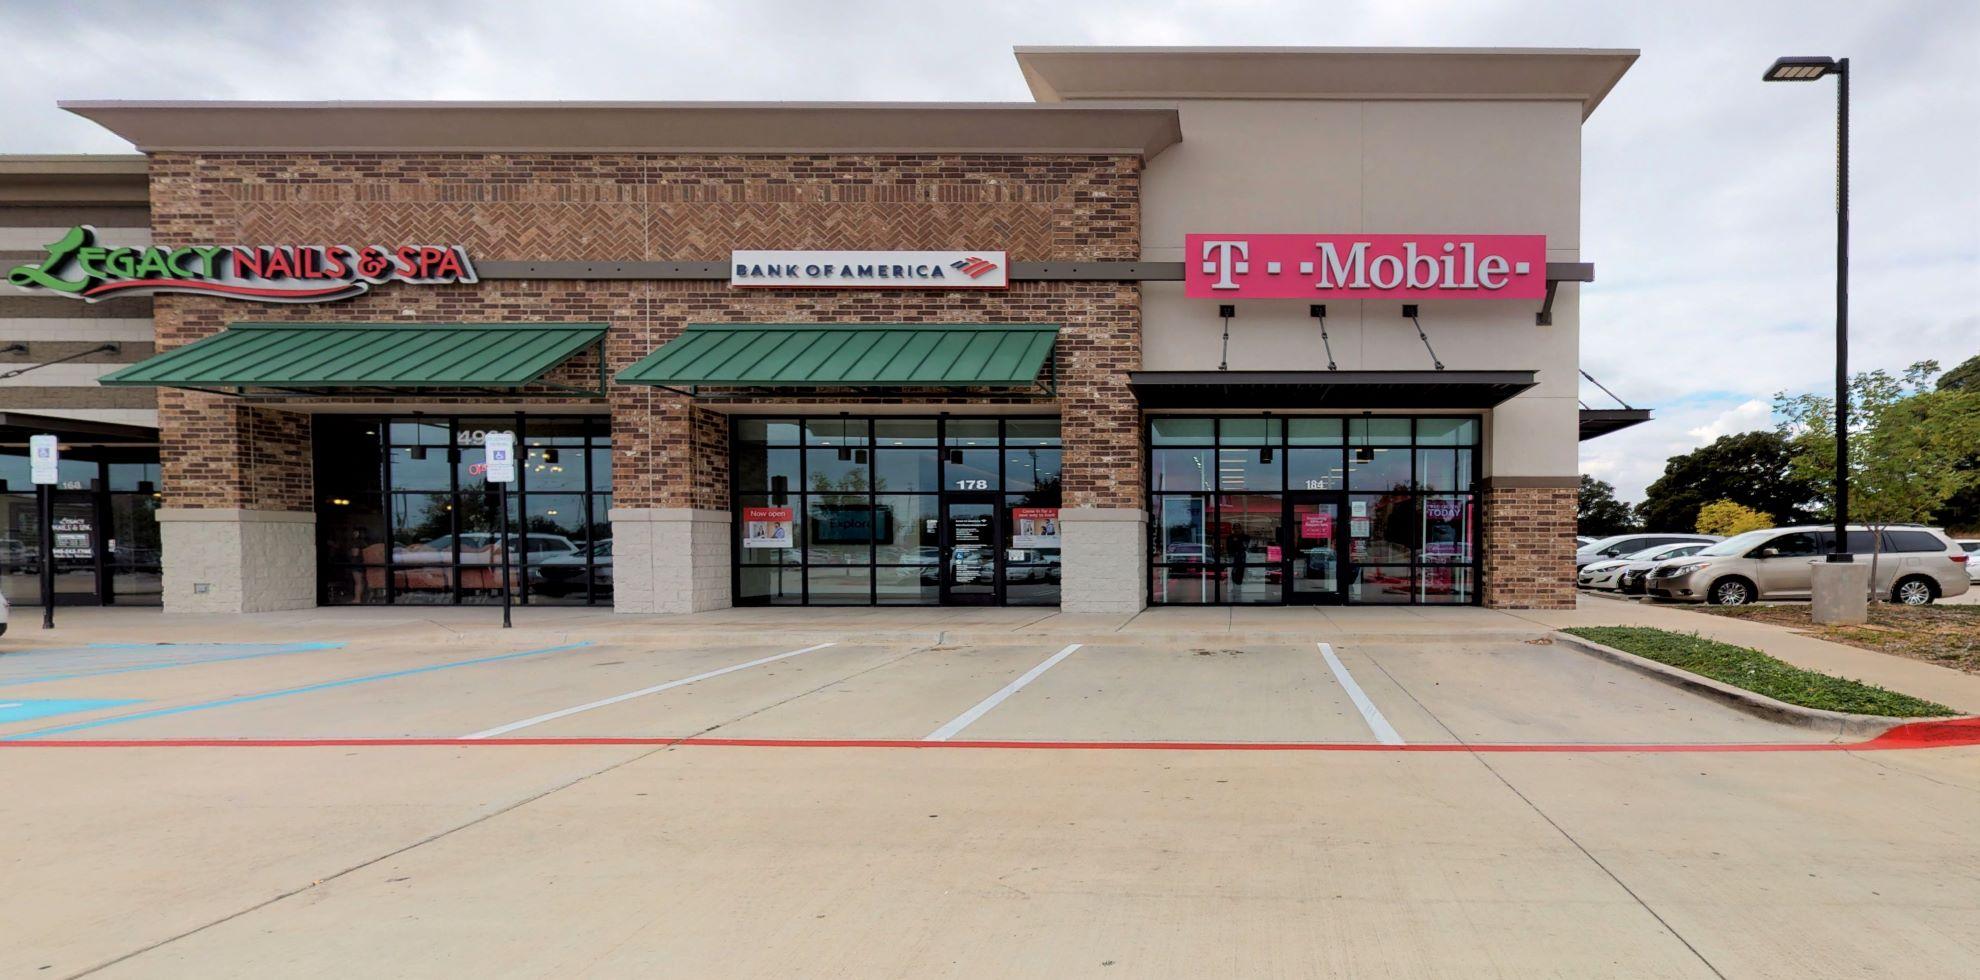 Bank of America Advanced Center with walk-up ATM   4920 Teasley Ln STE 176, Denton, TX 76210